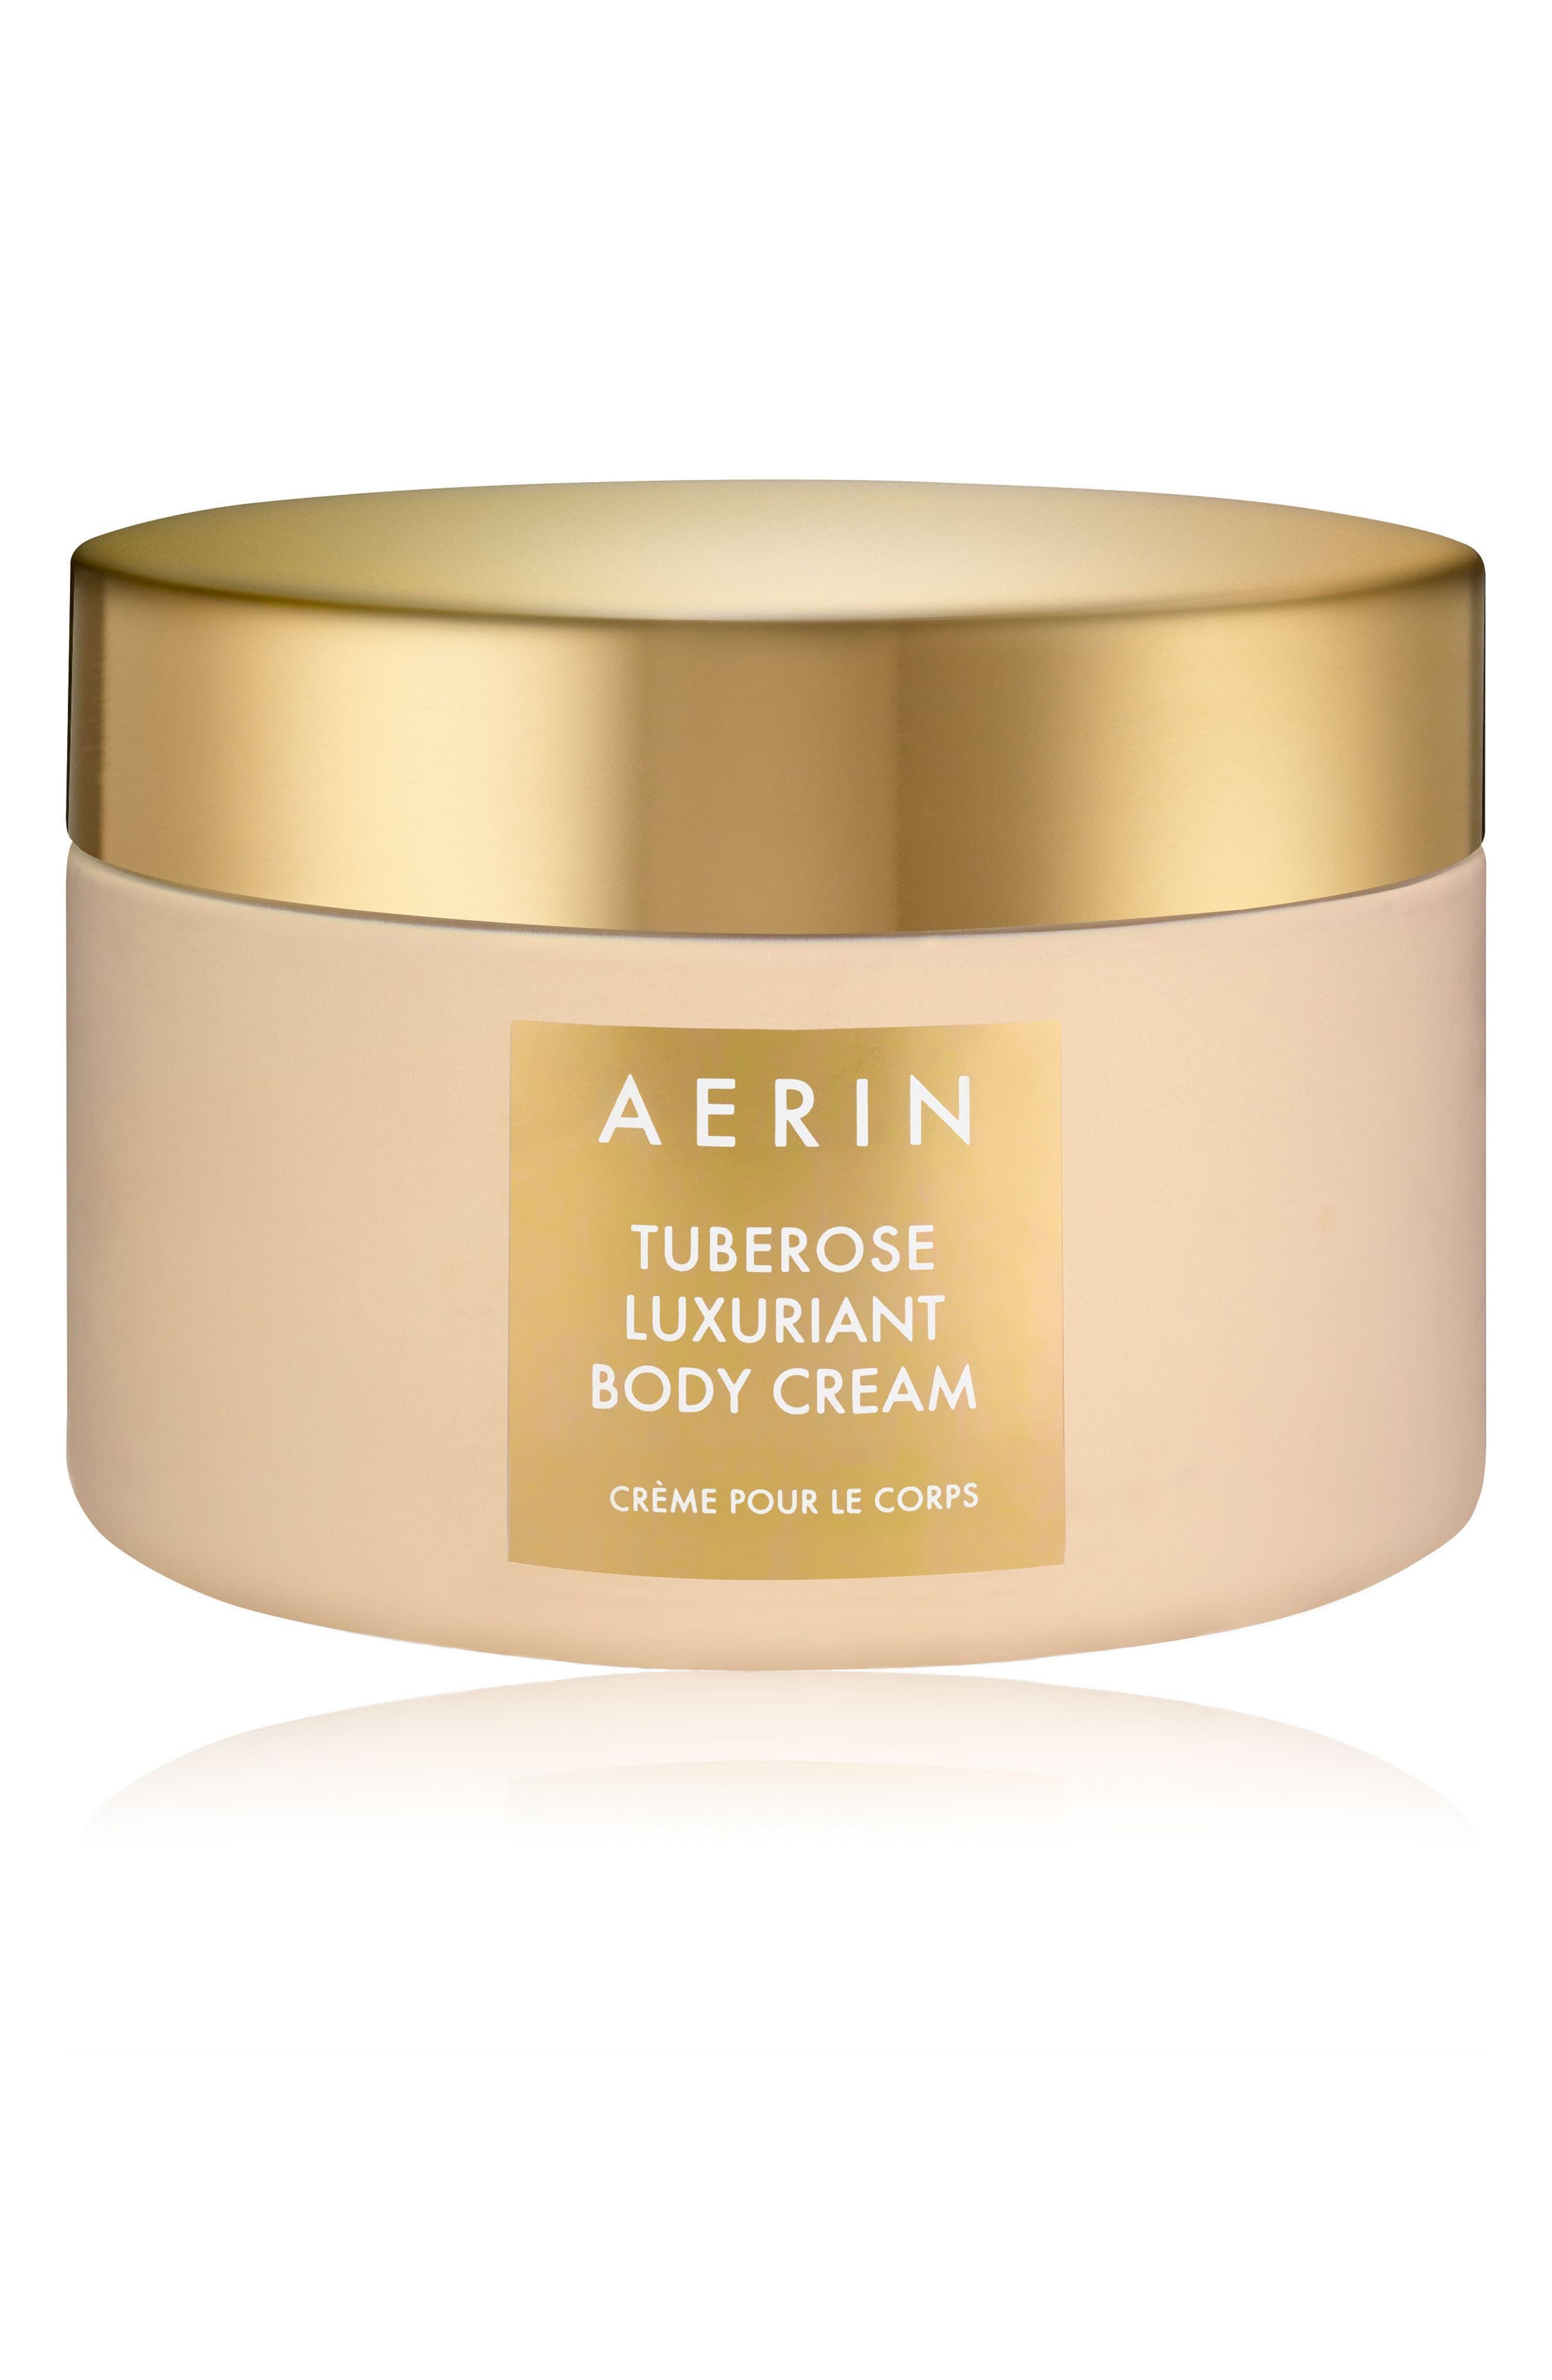 AERIN Beauty Tuberose Luxuriant Body Cream